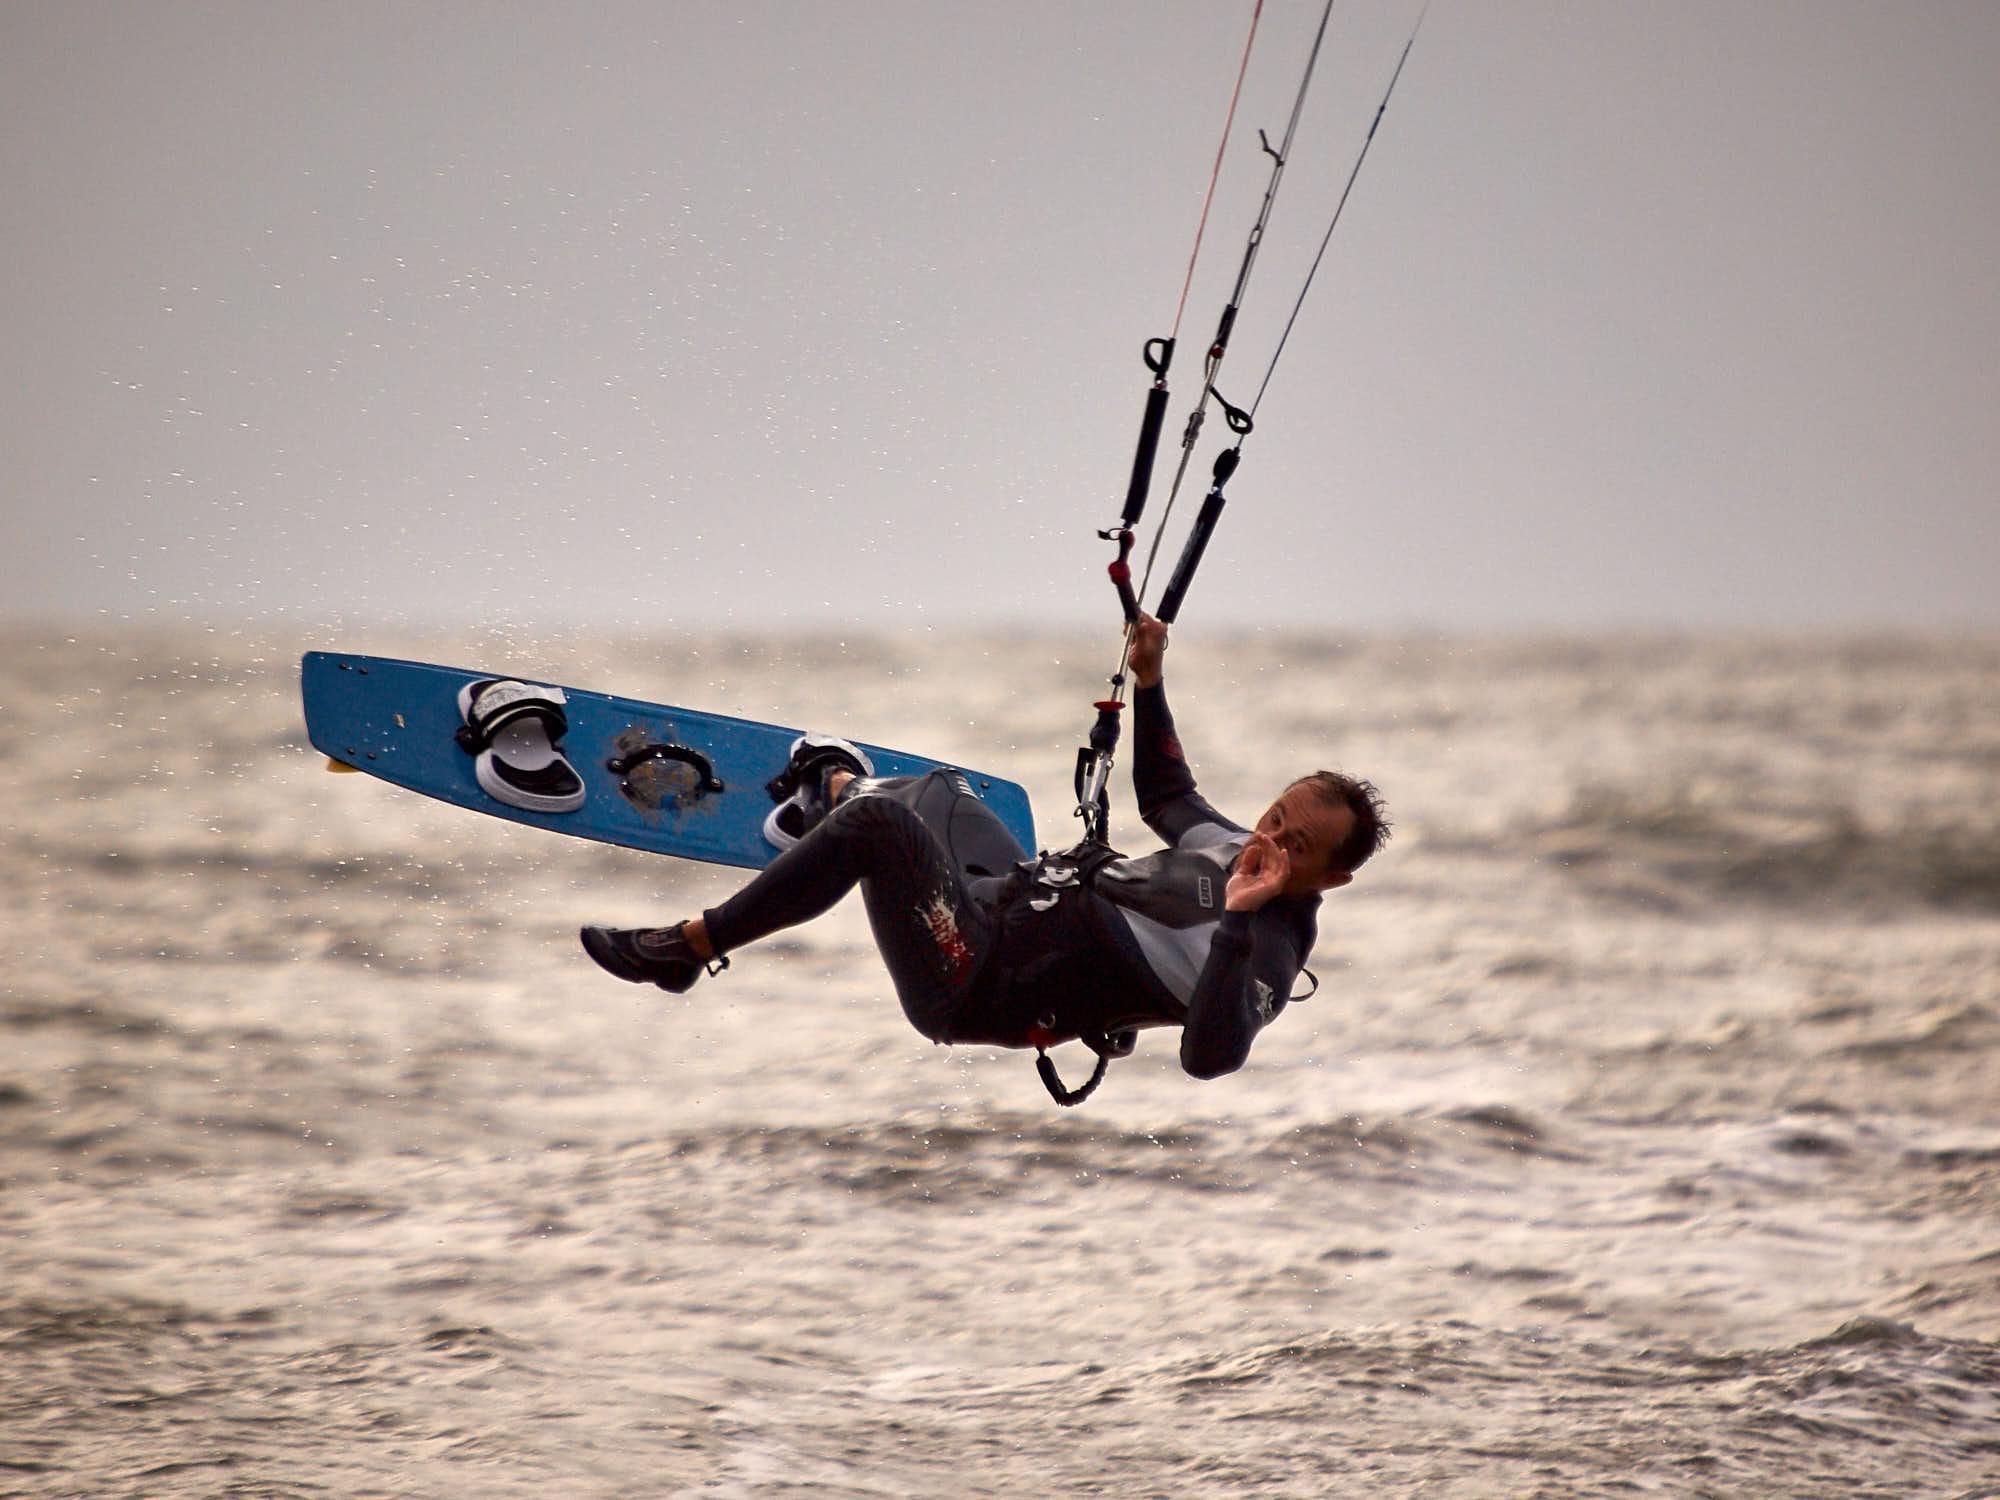 Patrick Beuzit, Maitres du vent, Sport, Kitesurf